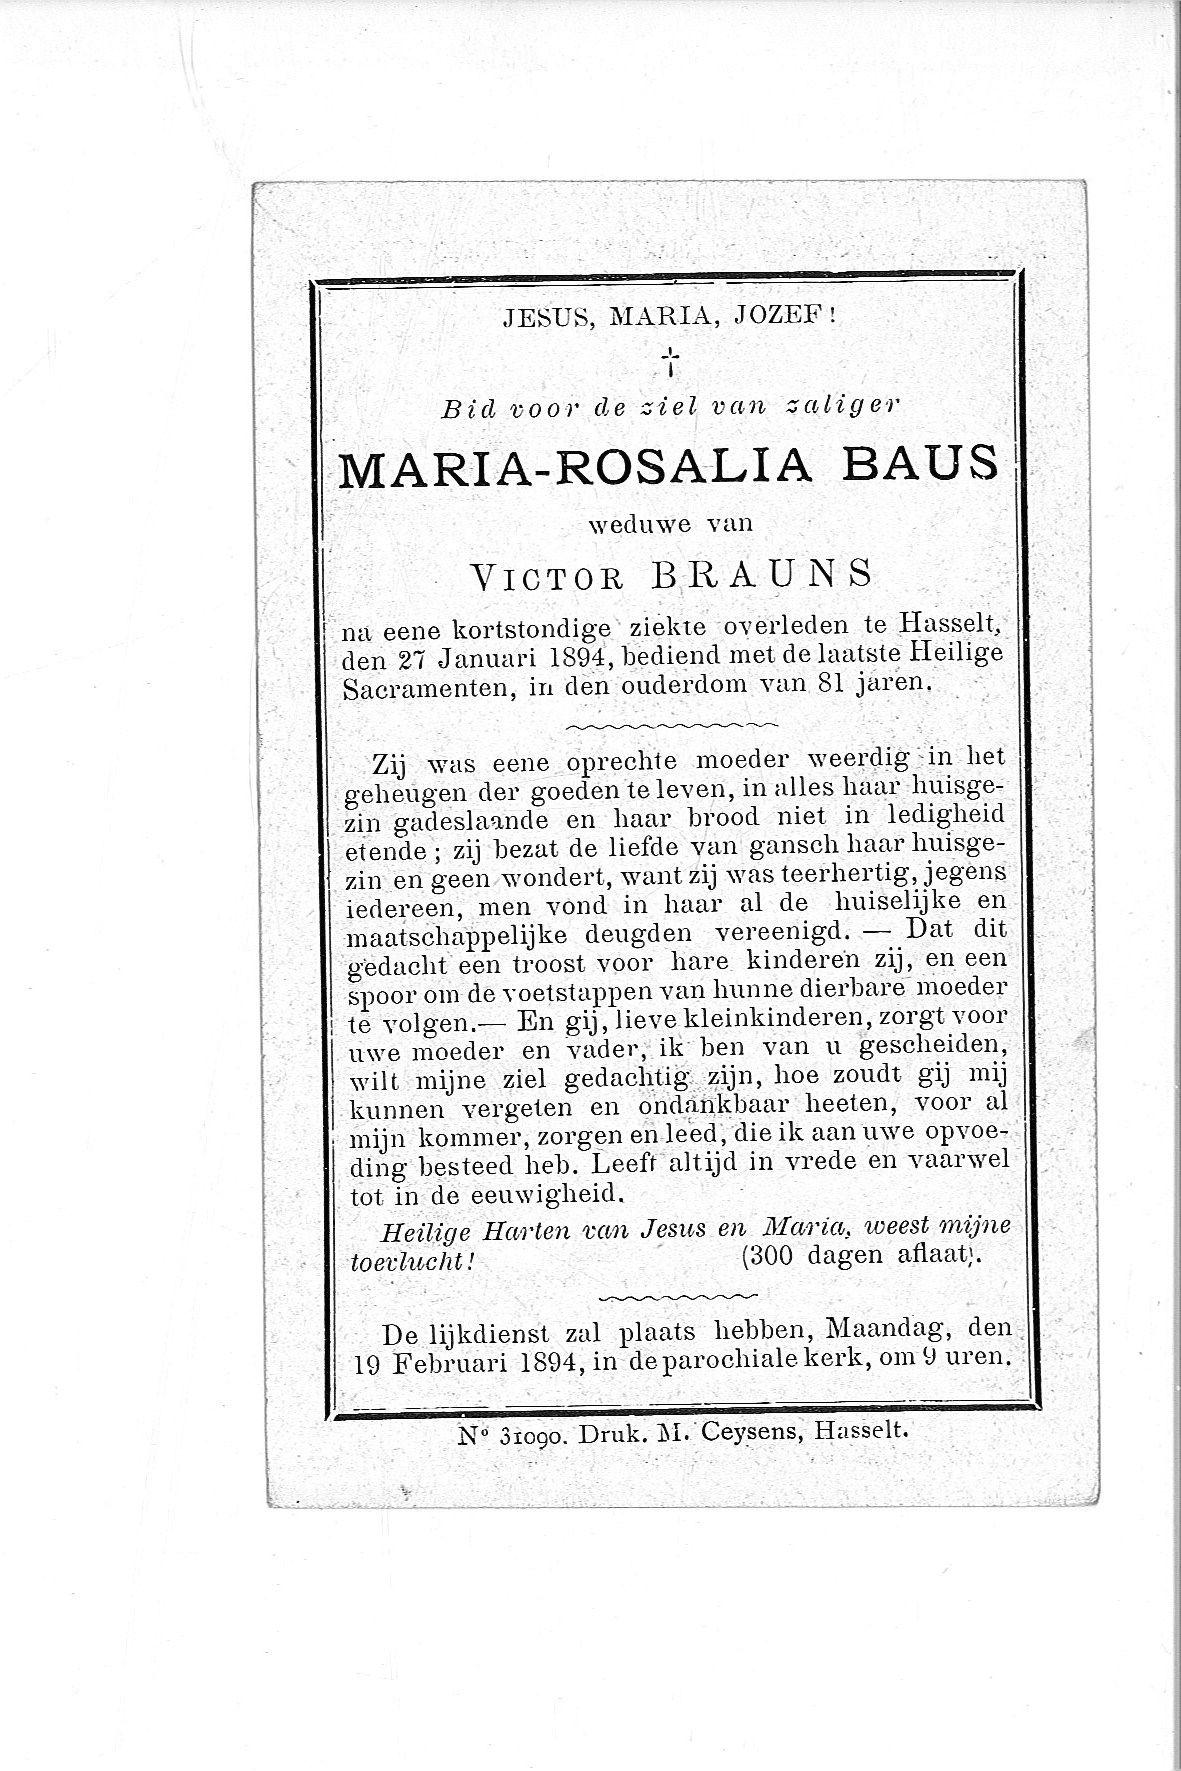 maria-rosalia(1895)20090709113558_00035.jpg